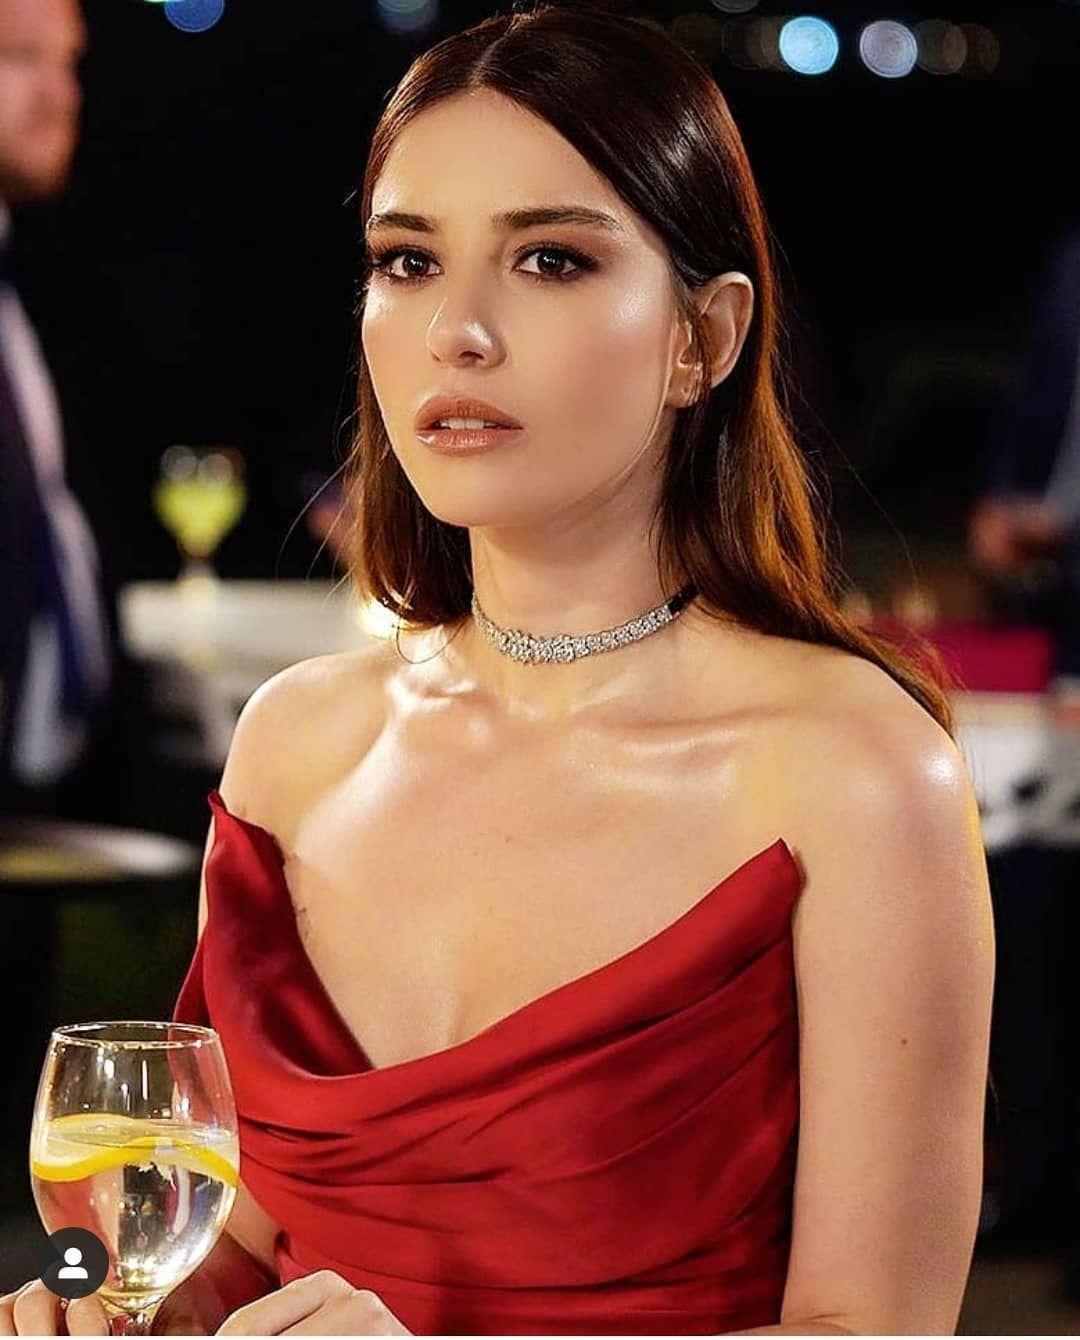 Ozge Ha Compartido Una Publicacion En Instagram Love You Queen Ozgecangurelofficial Beautiful Girl Face Turkish Women Beautiful Most Handsome Actors